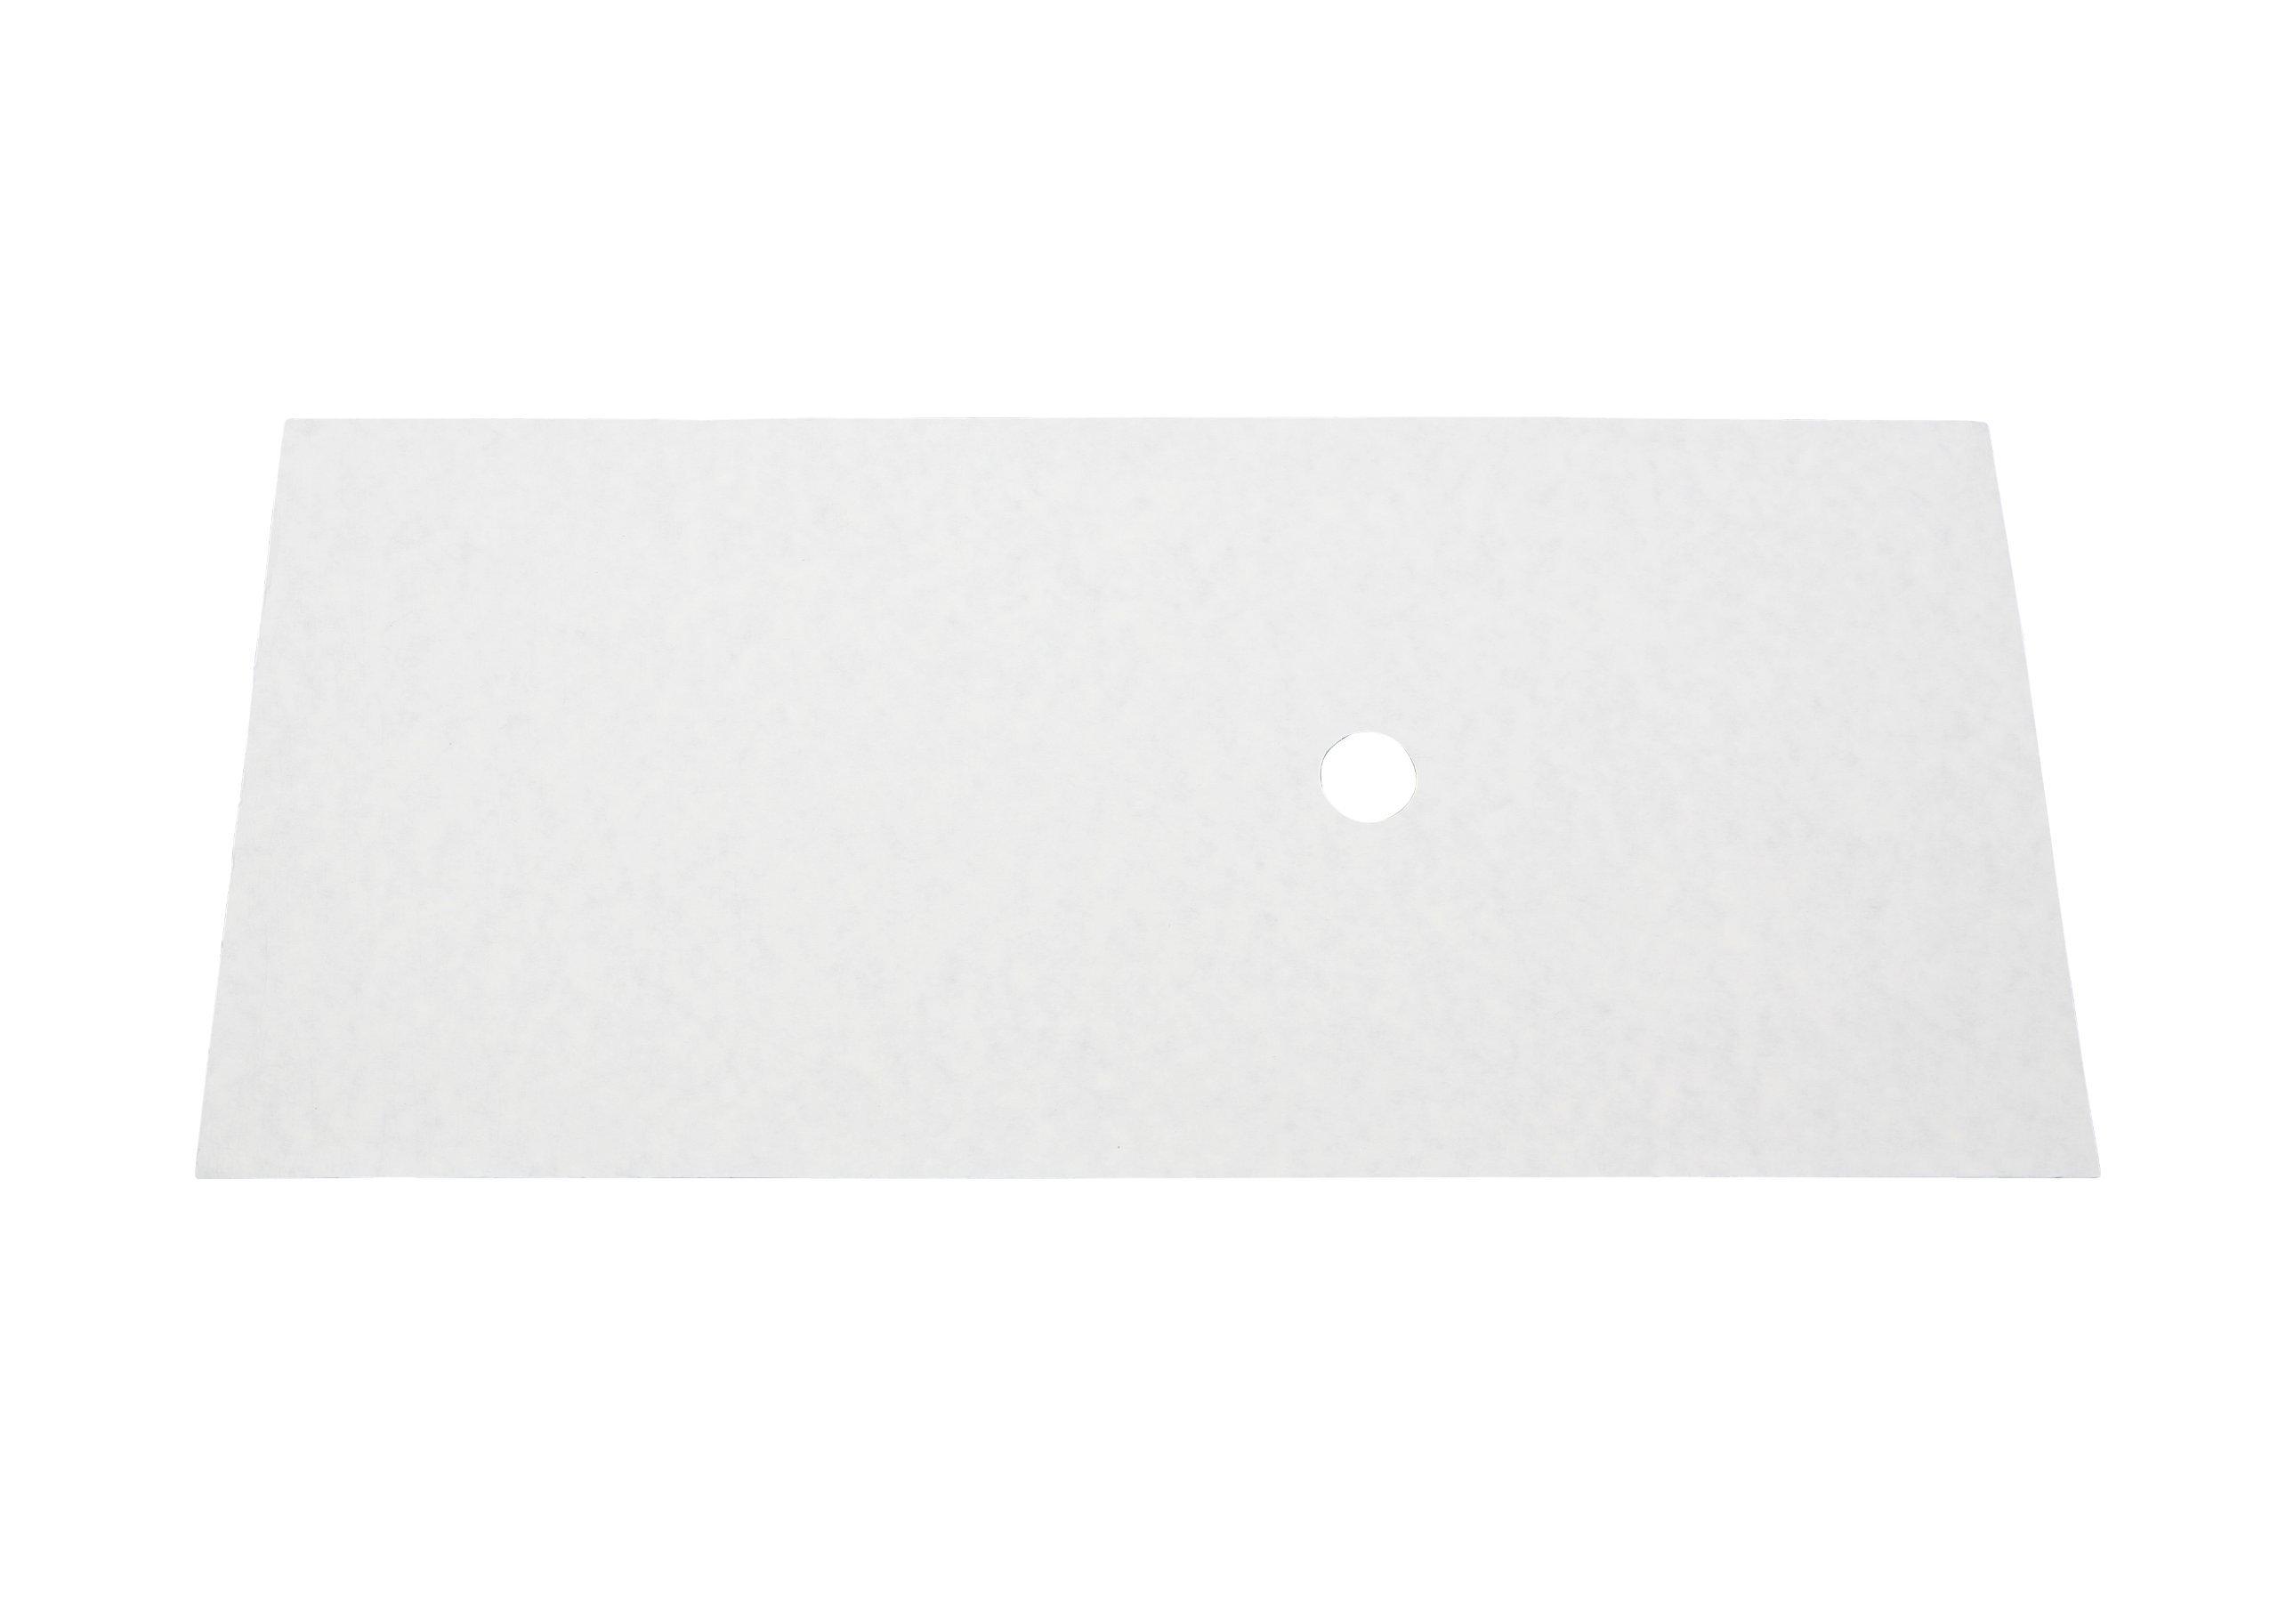 PRINCE CASTLE 108-128 Filter Paper